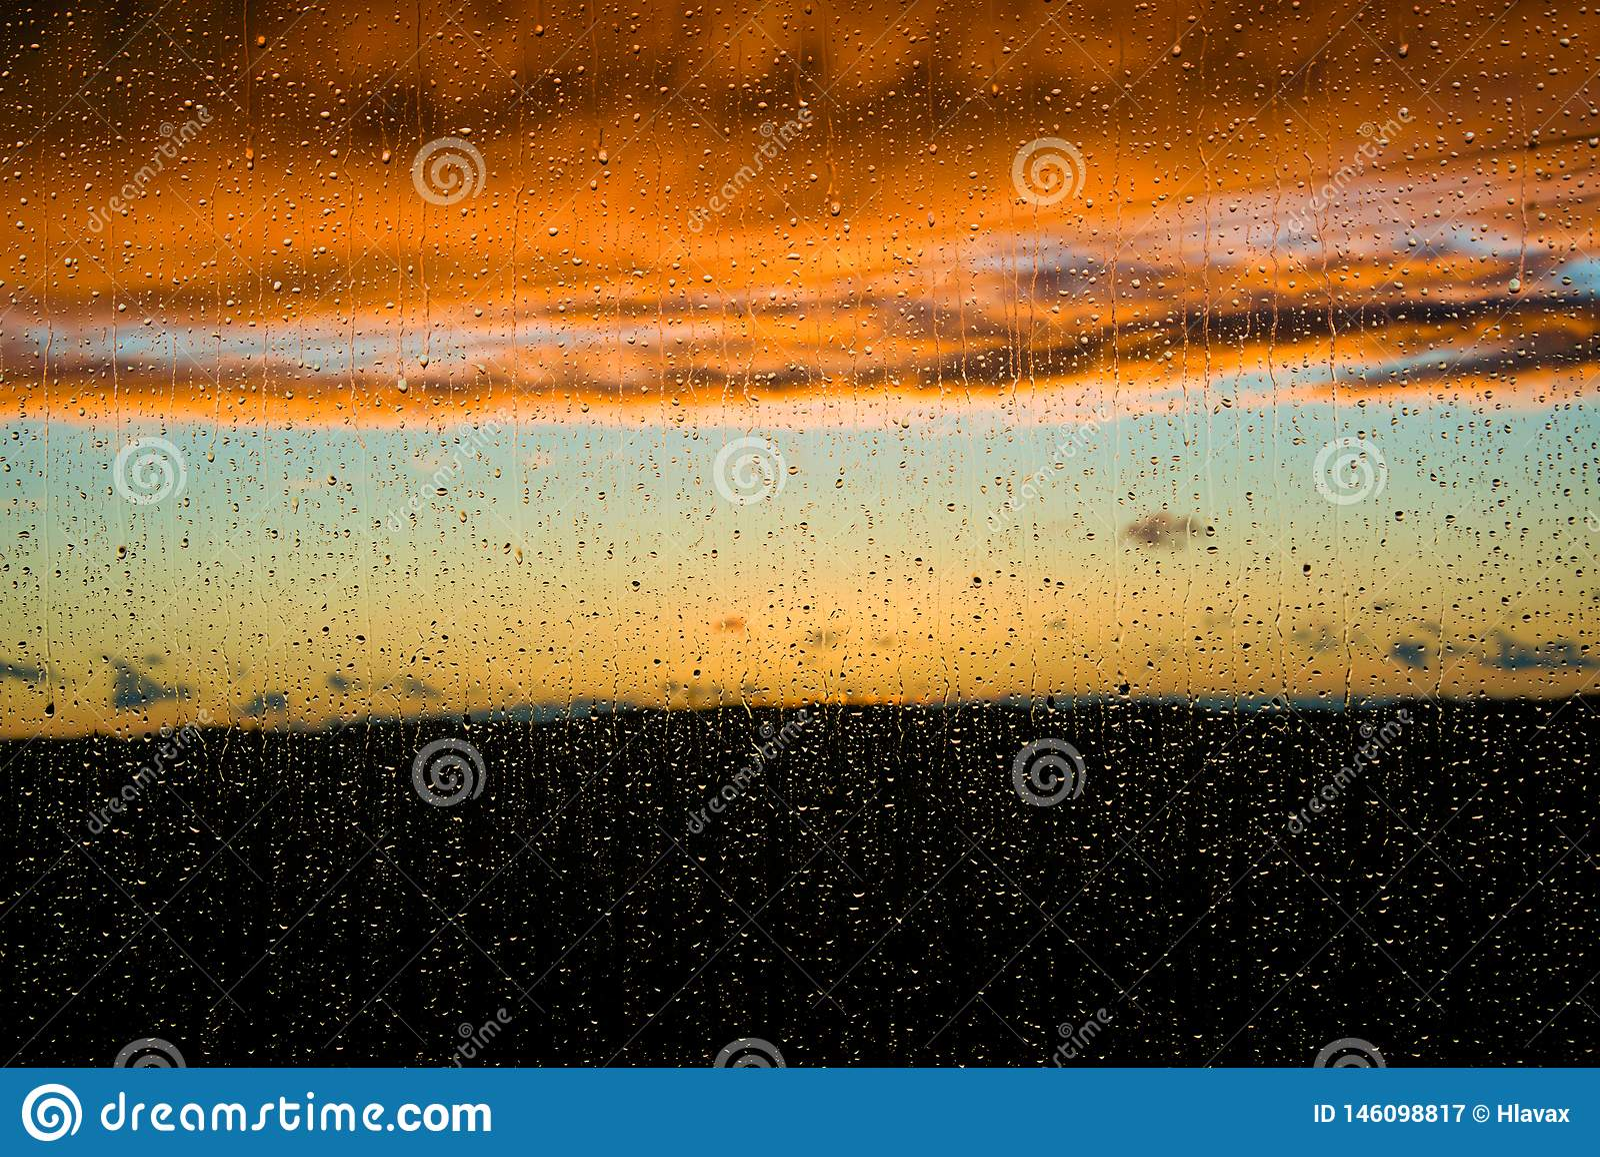 Sunset under the rain through the window